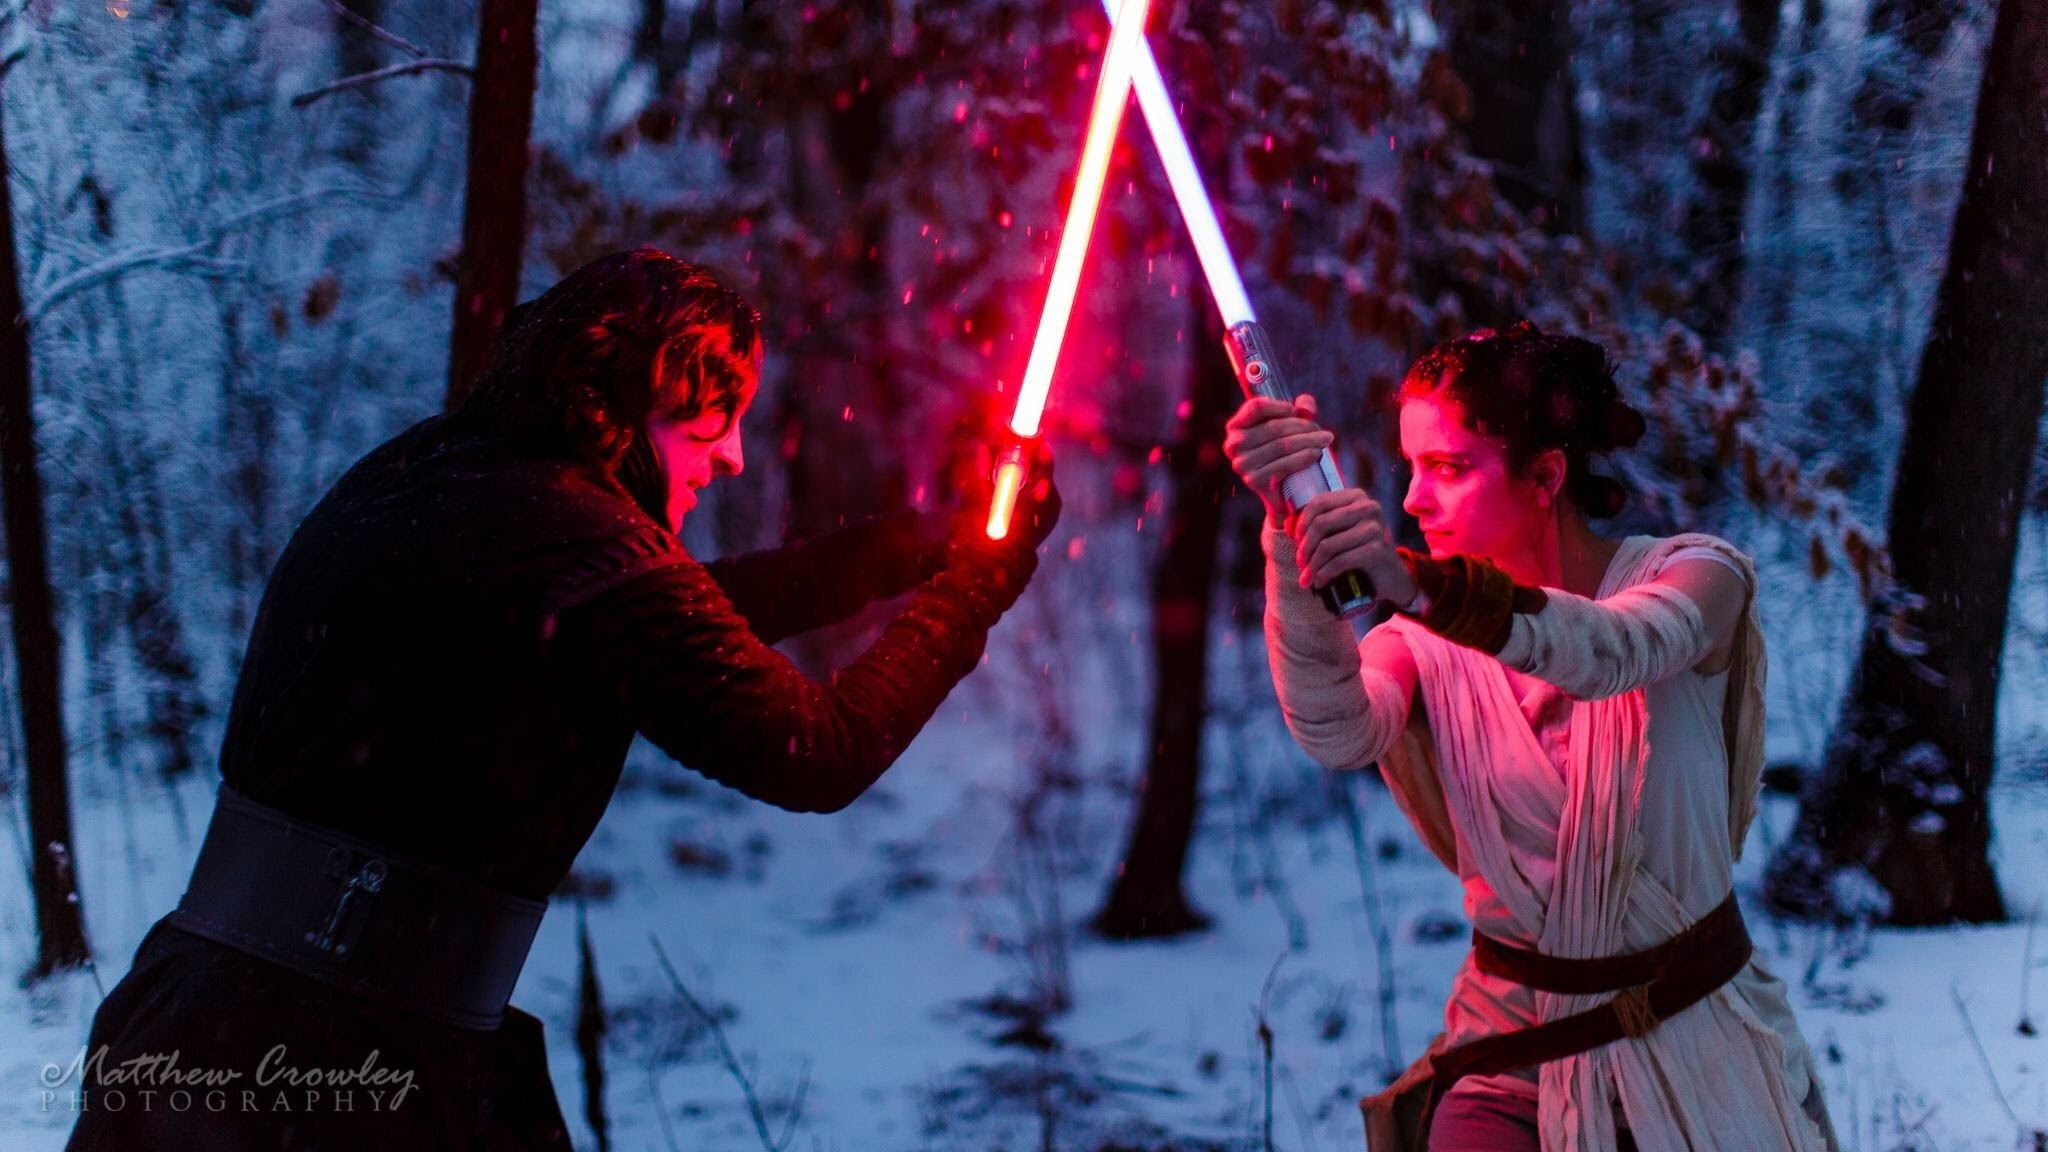 Kylo Ren Vs Rey Fight- Star Wars 7 1080p (HD)